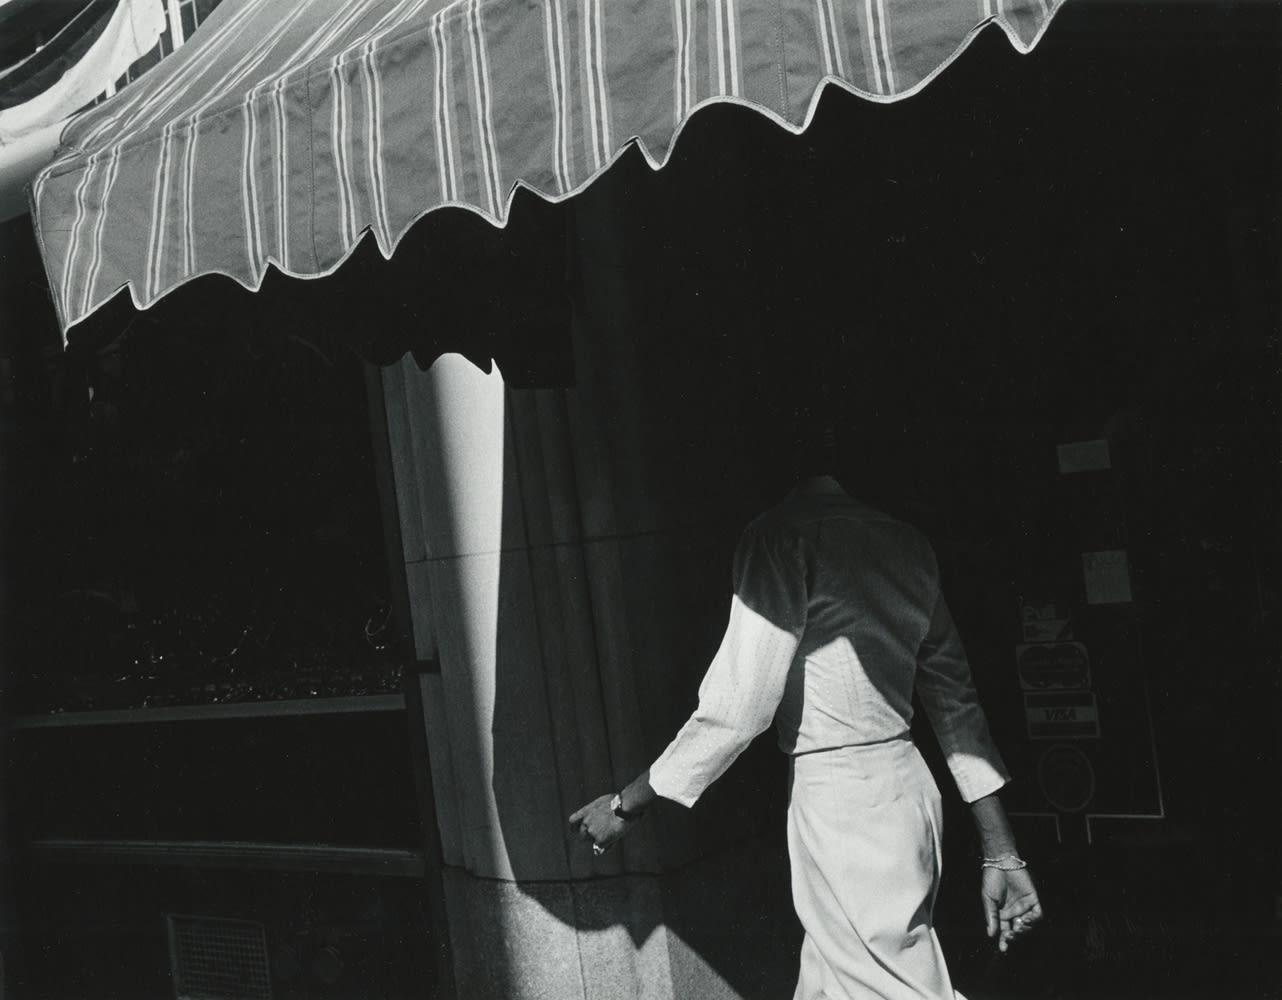 Ray K. Metzker, City Whispers, 1982